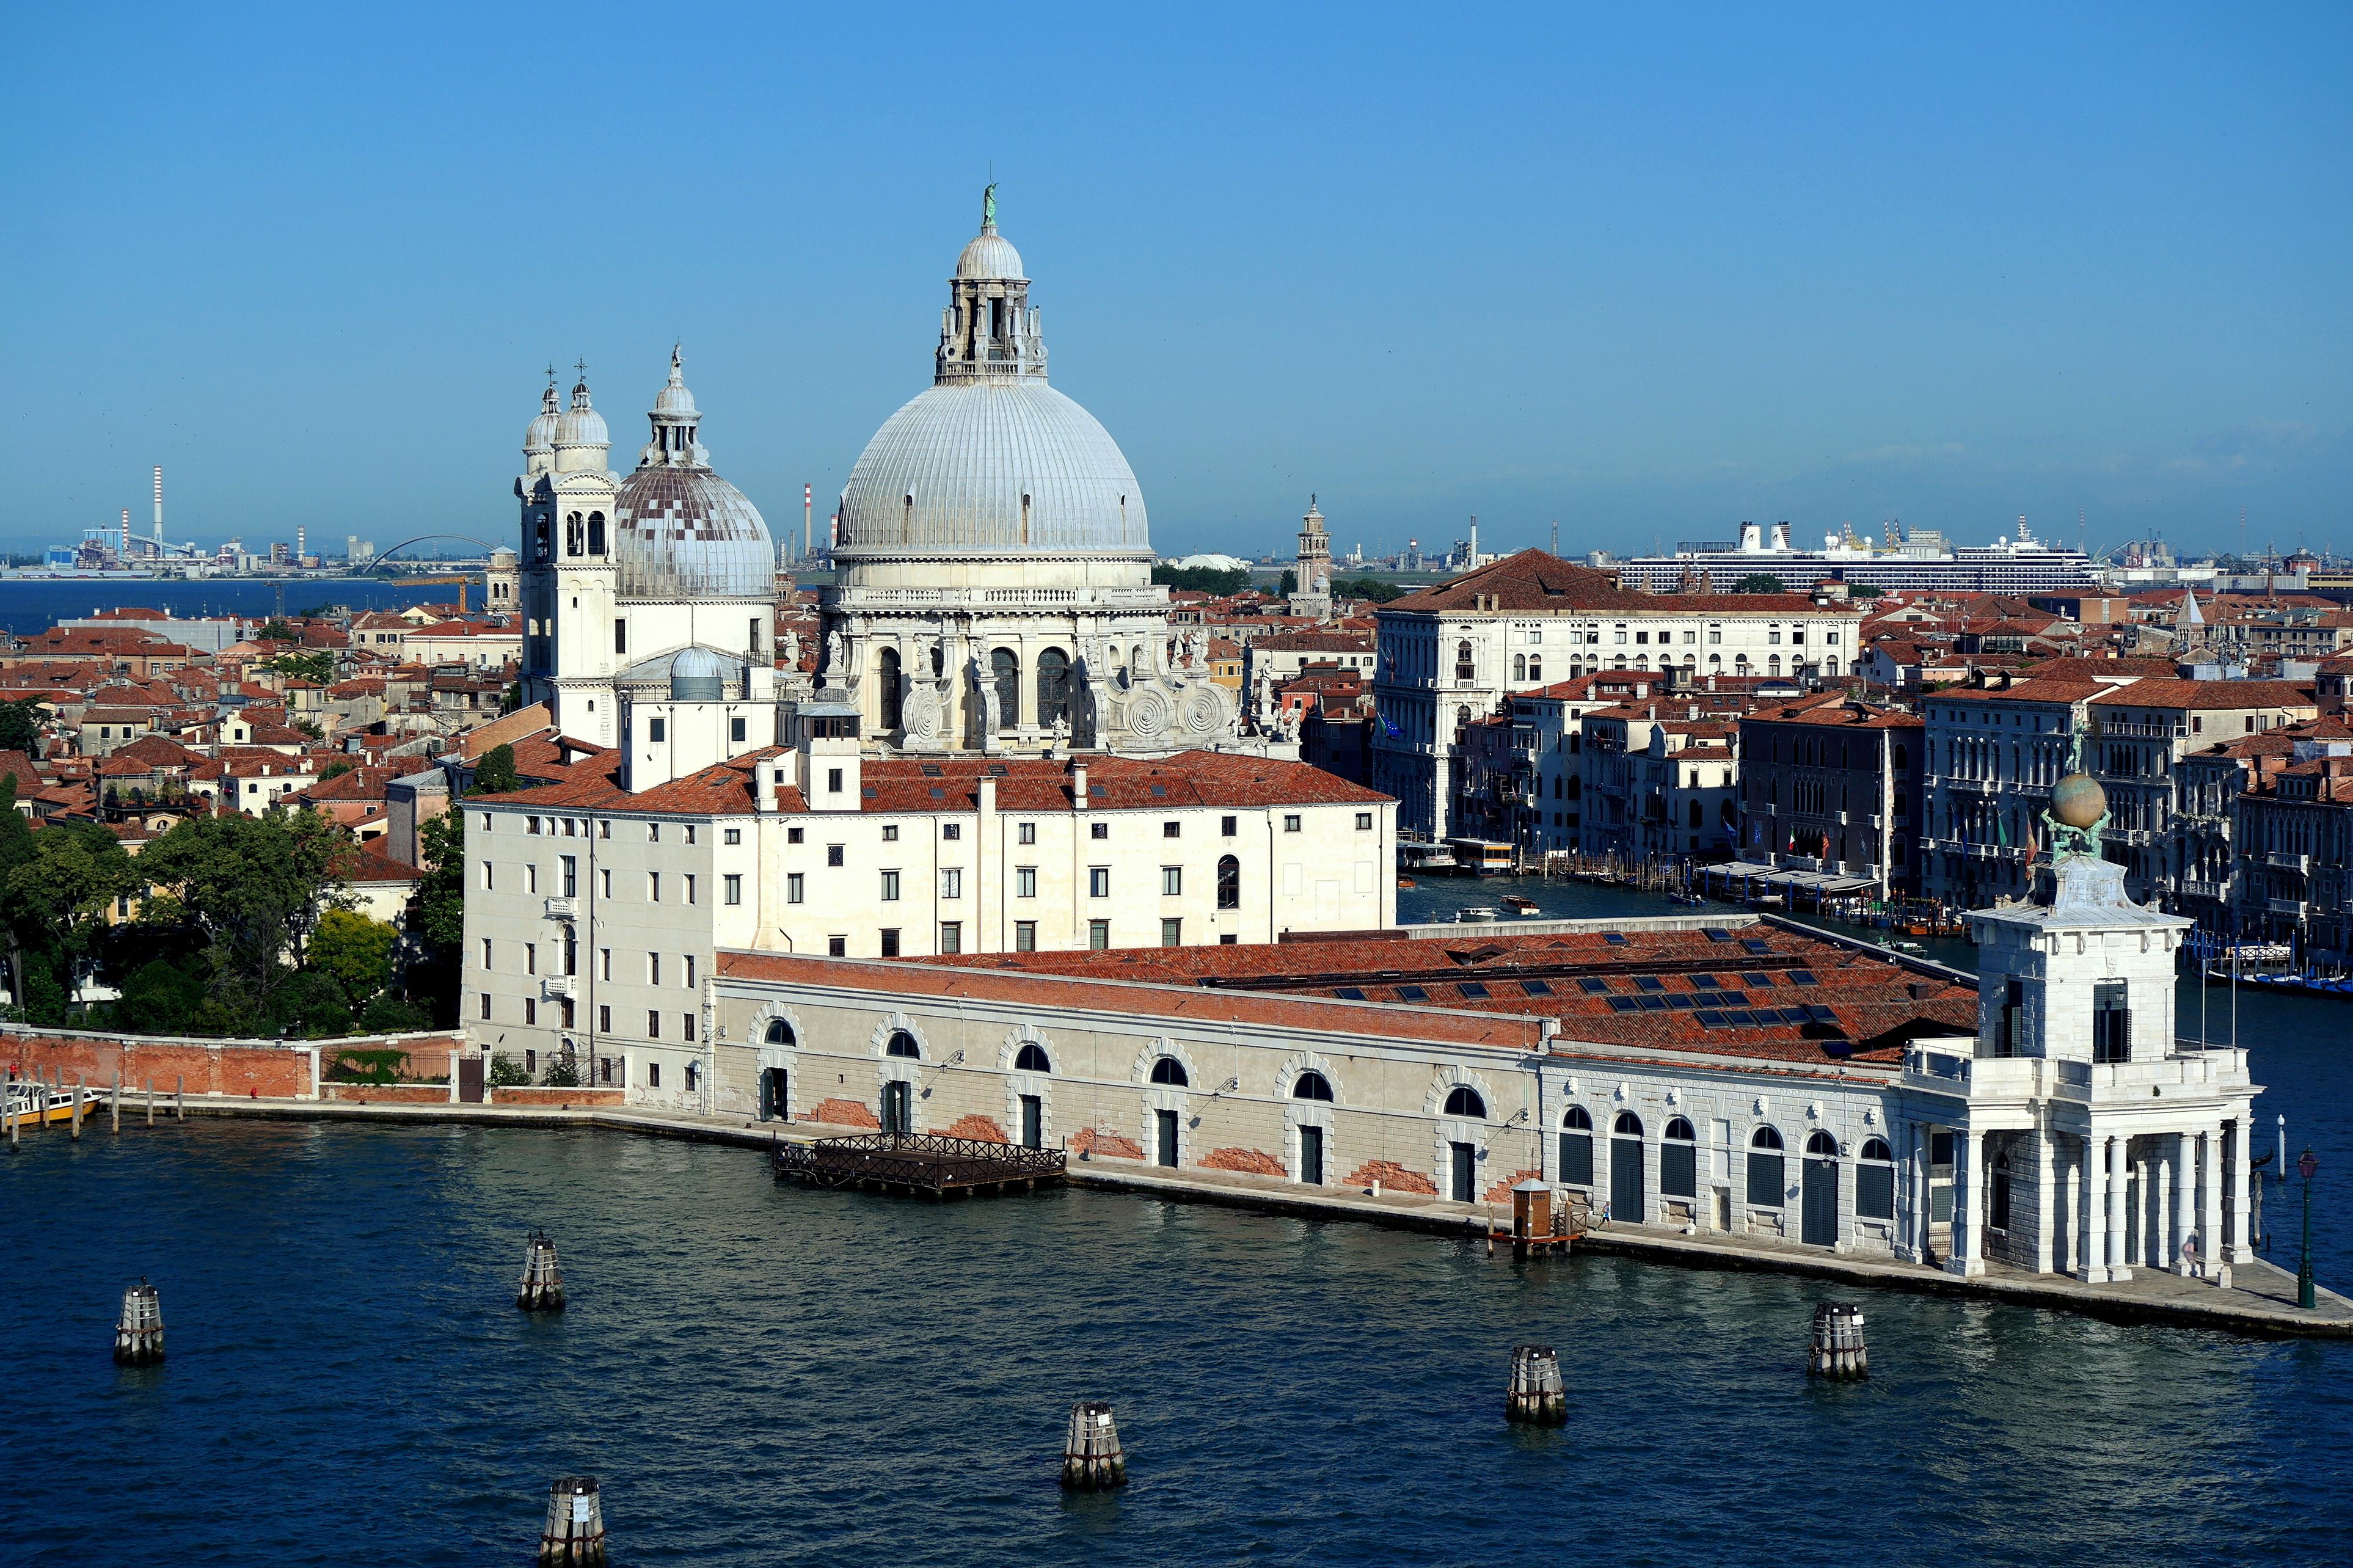 File:Venezia - Panorama 012, Santa Maria della Salute.jpg ...